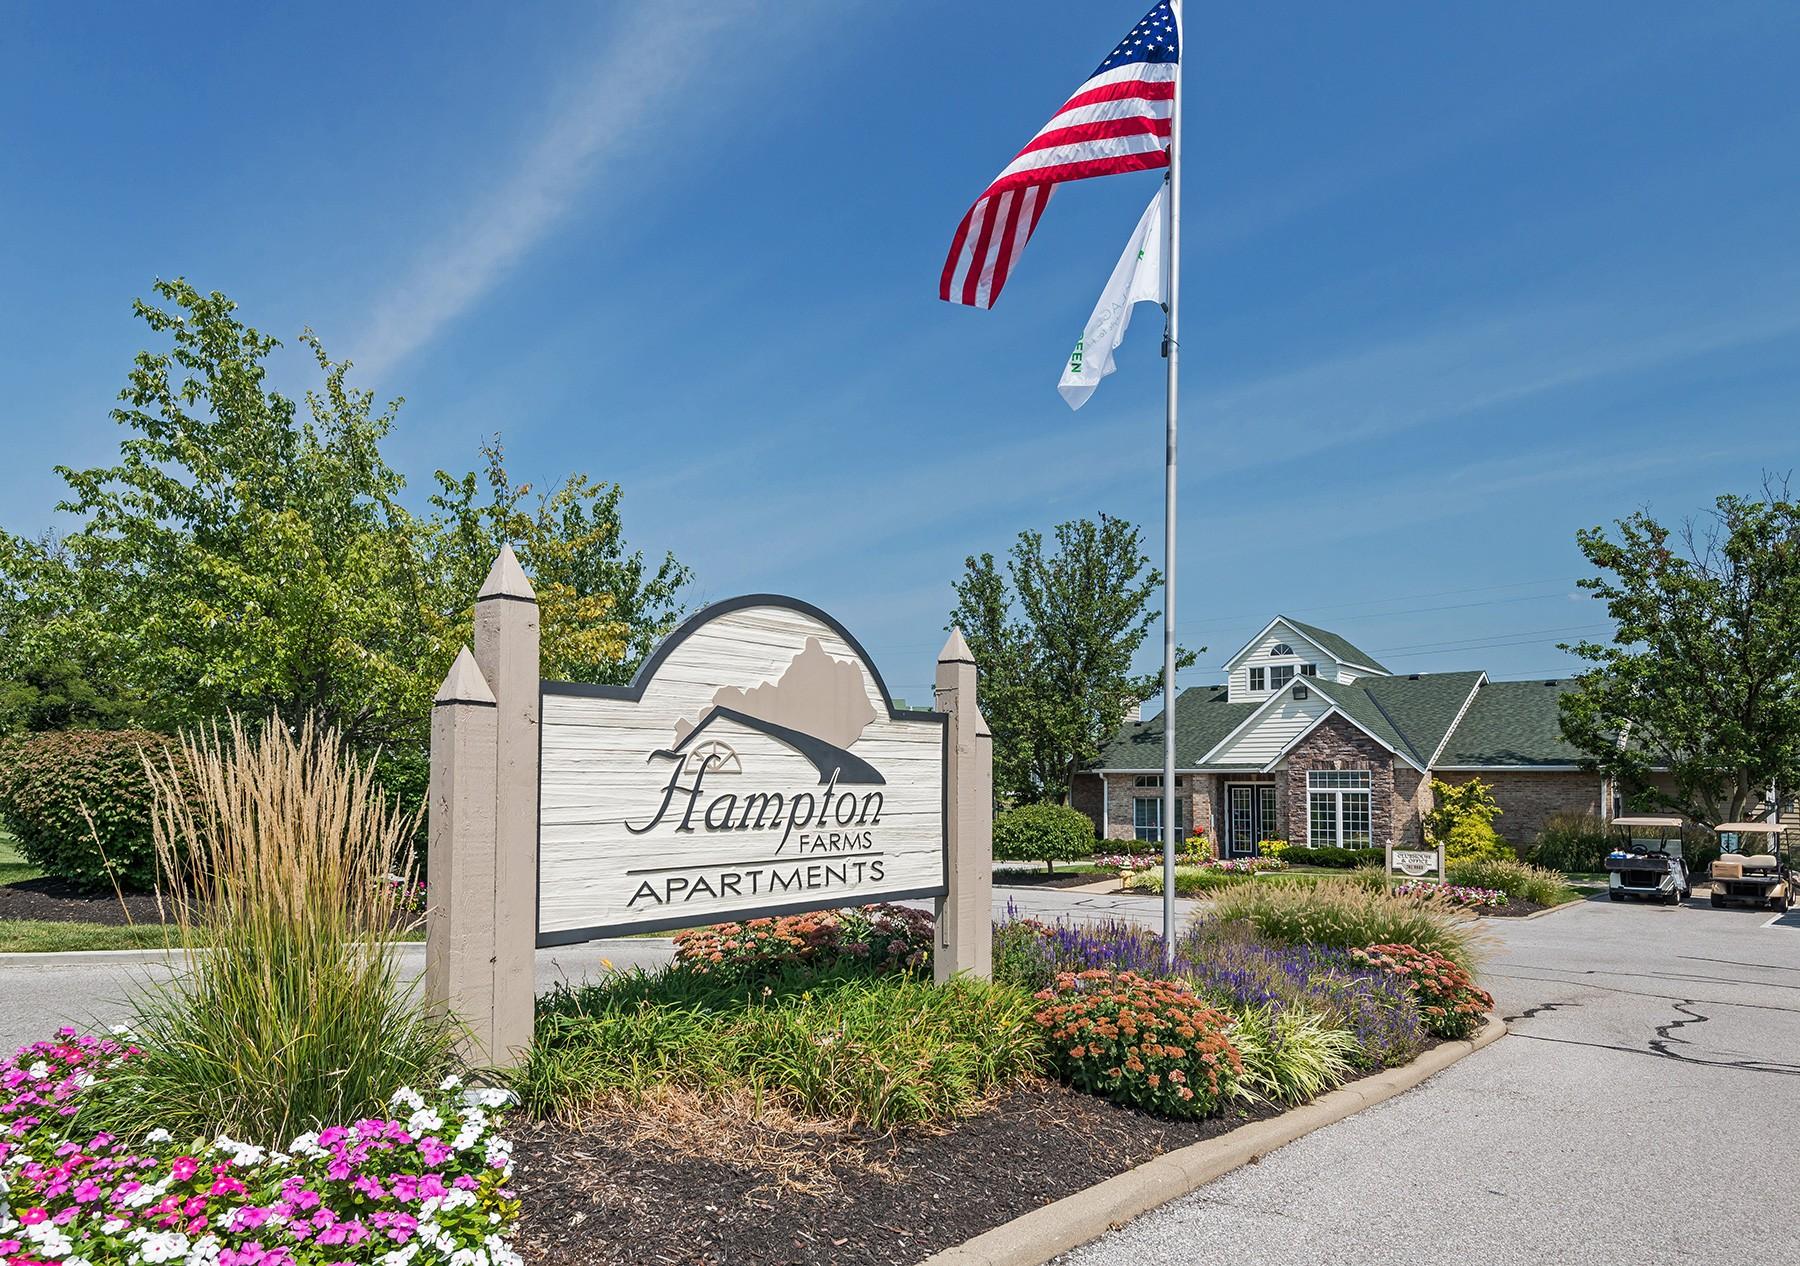 Hampton Farms for rent